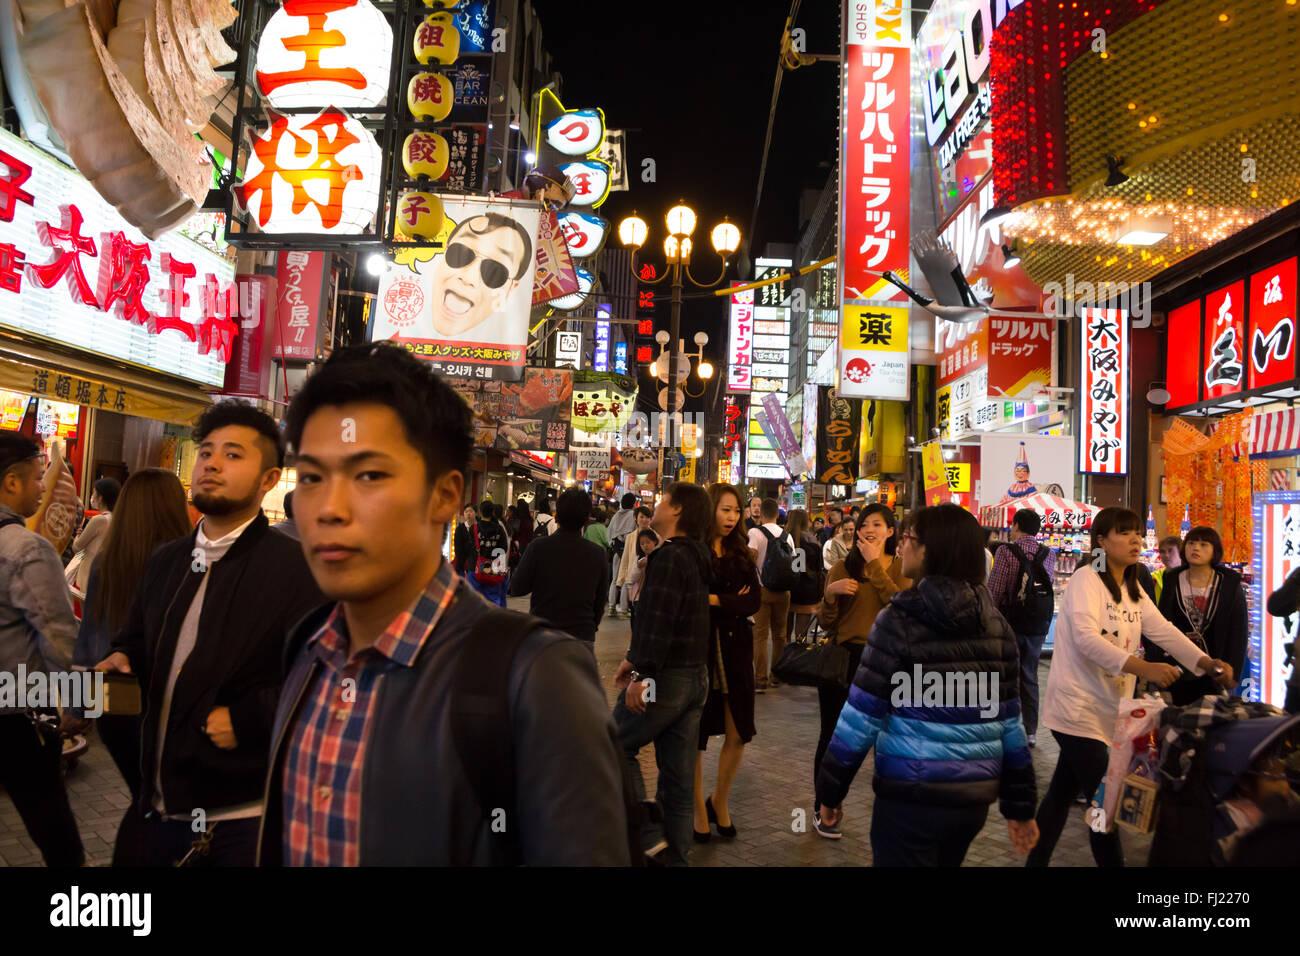 Nachtleben in Dotonbori, Osaka, Japan Stockbild